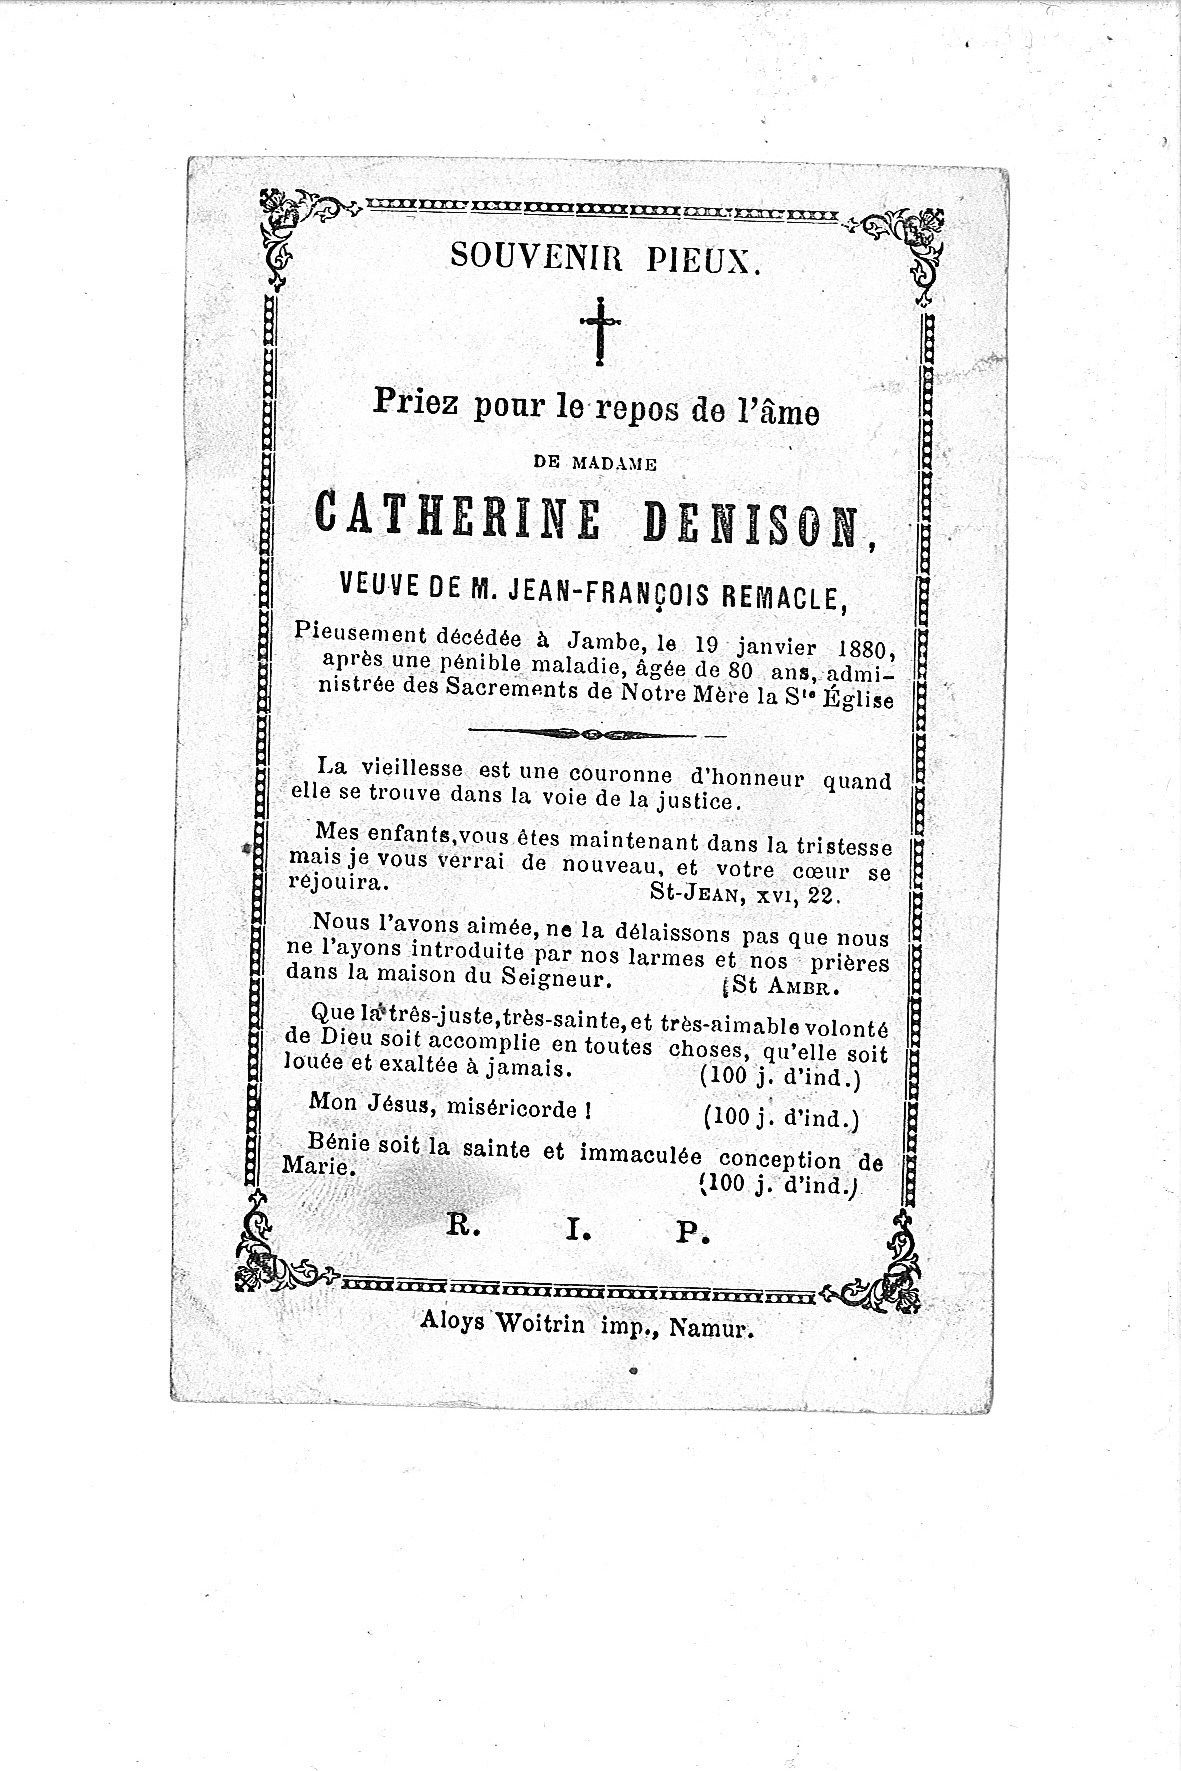 Catherine(1880)20091002141227_00004.jpg